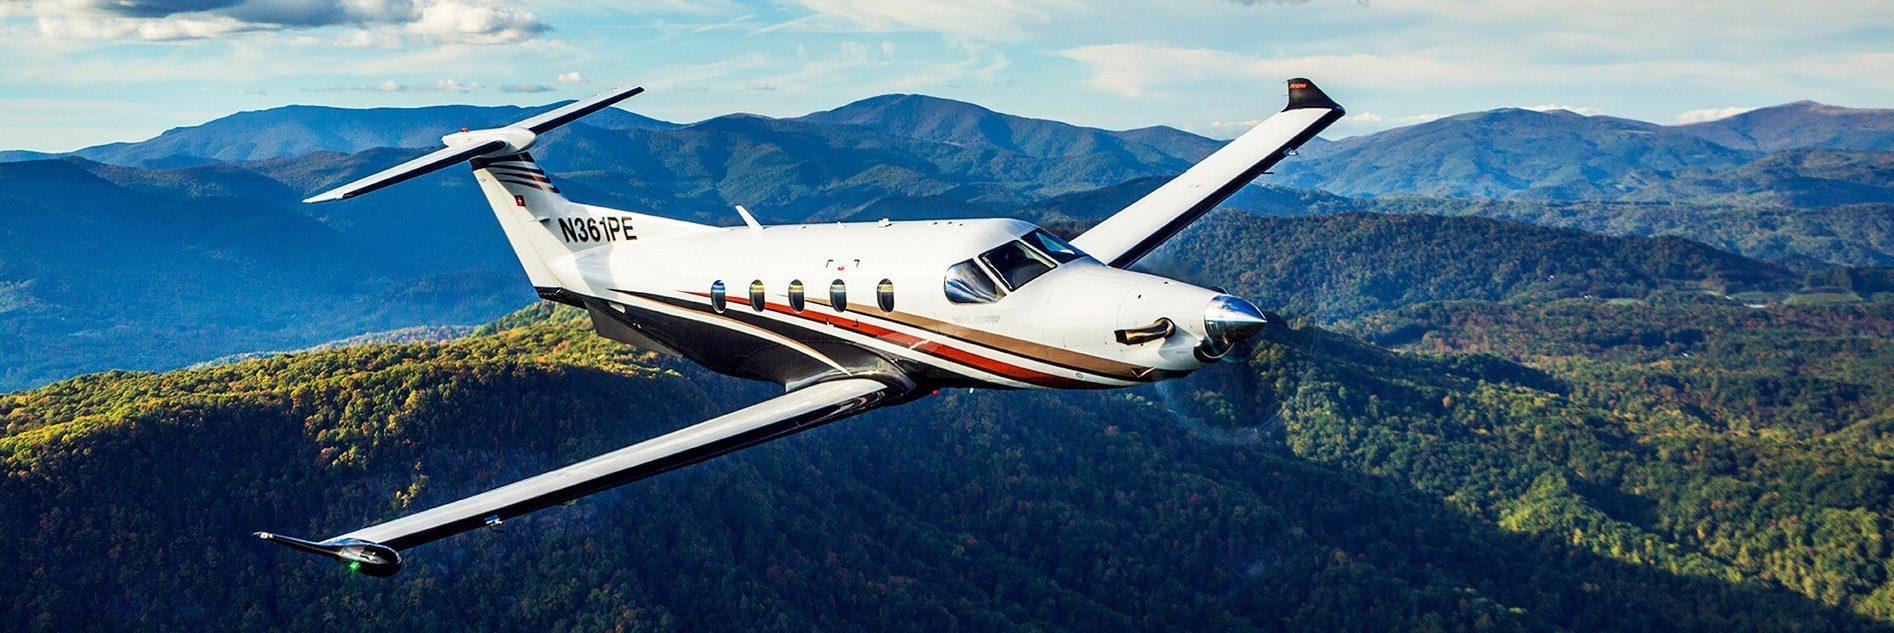 Pilatus PC-12 Over North Carolina Hillsides